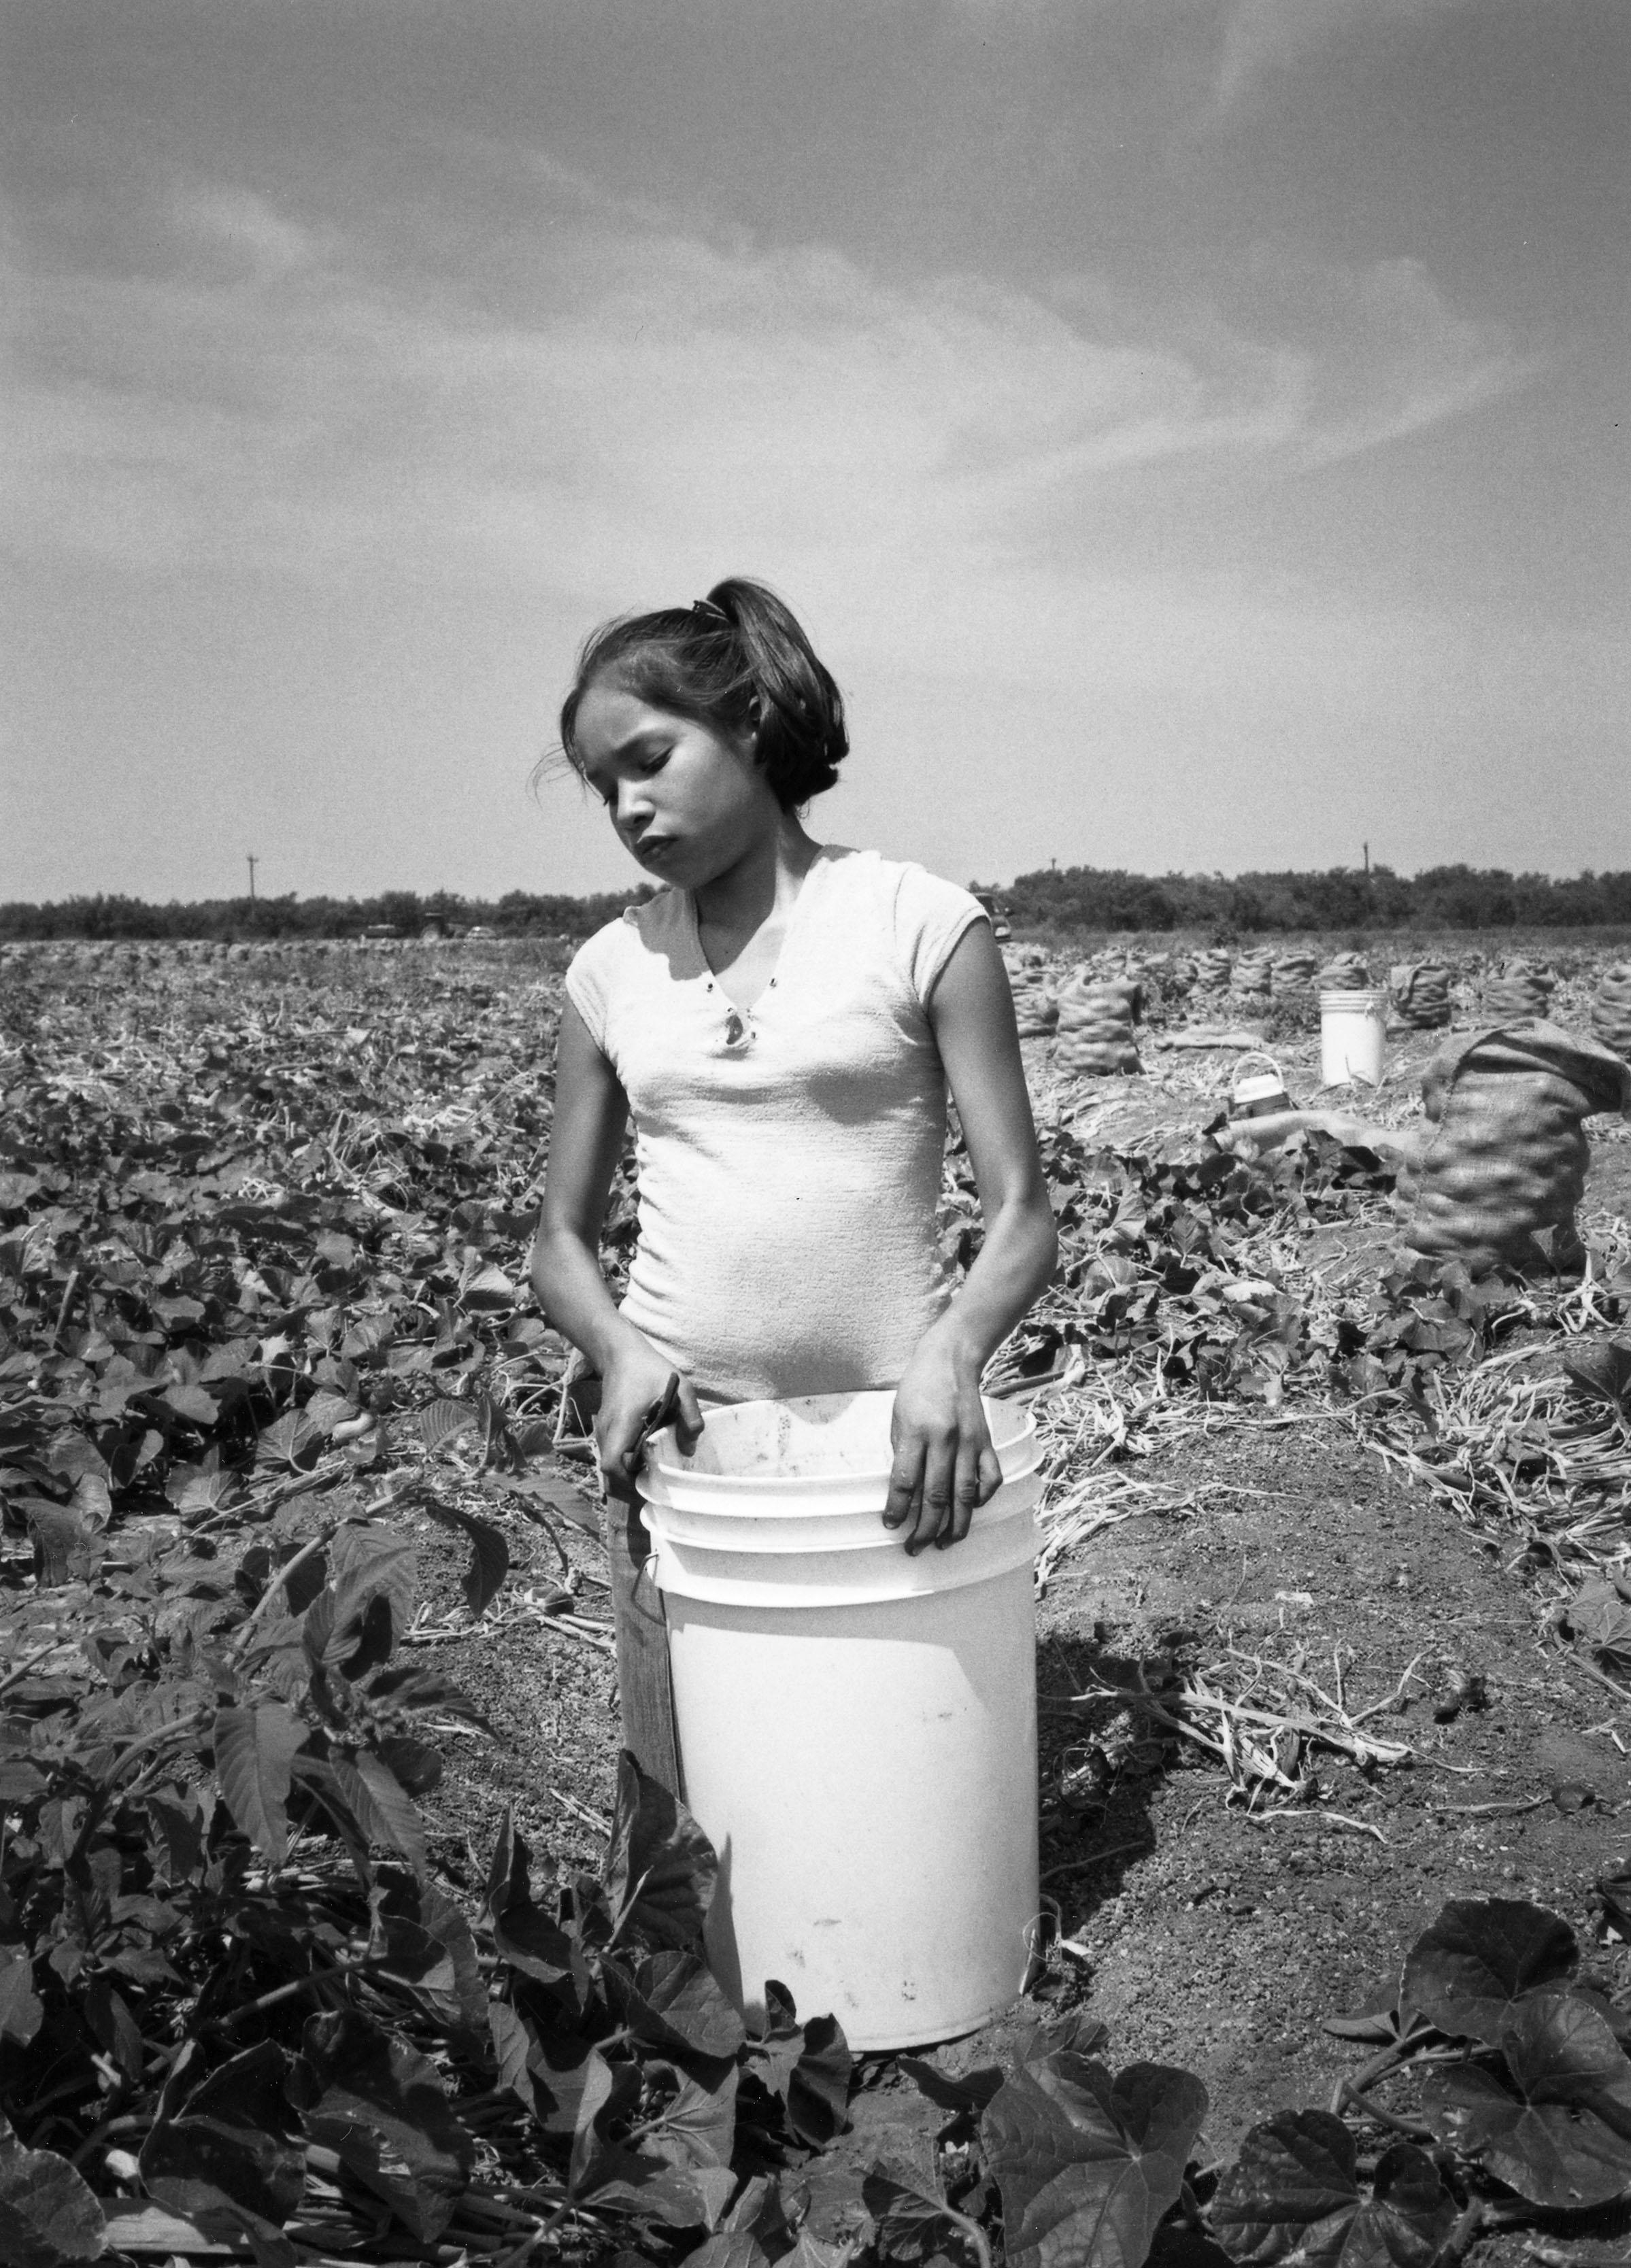 Yesenia, age 12, harvesting onions in South Texas (Photo courtesy of Robin Romano)